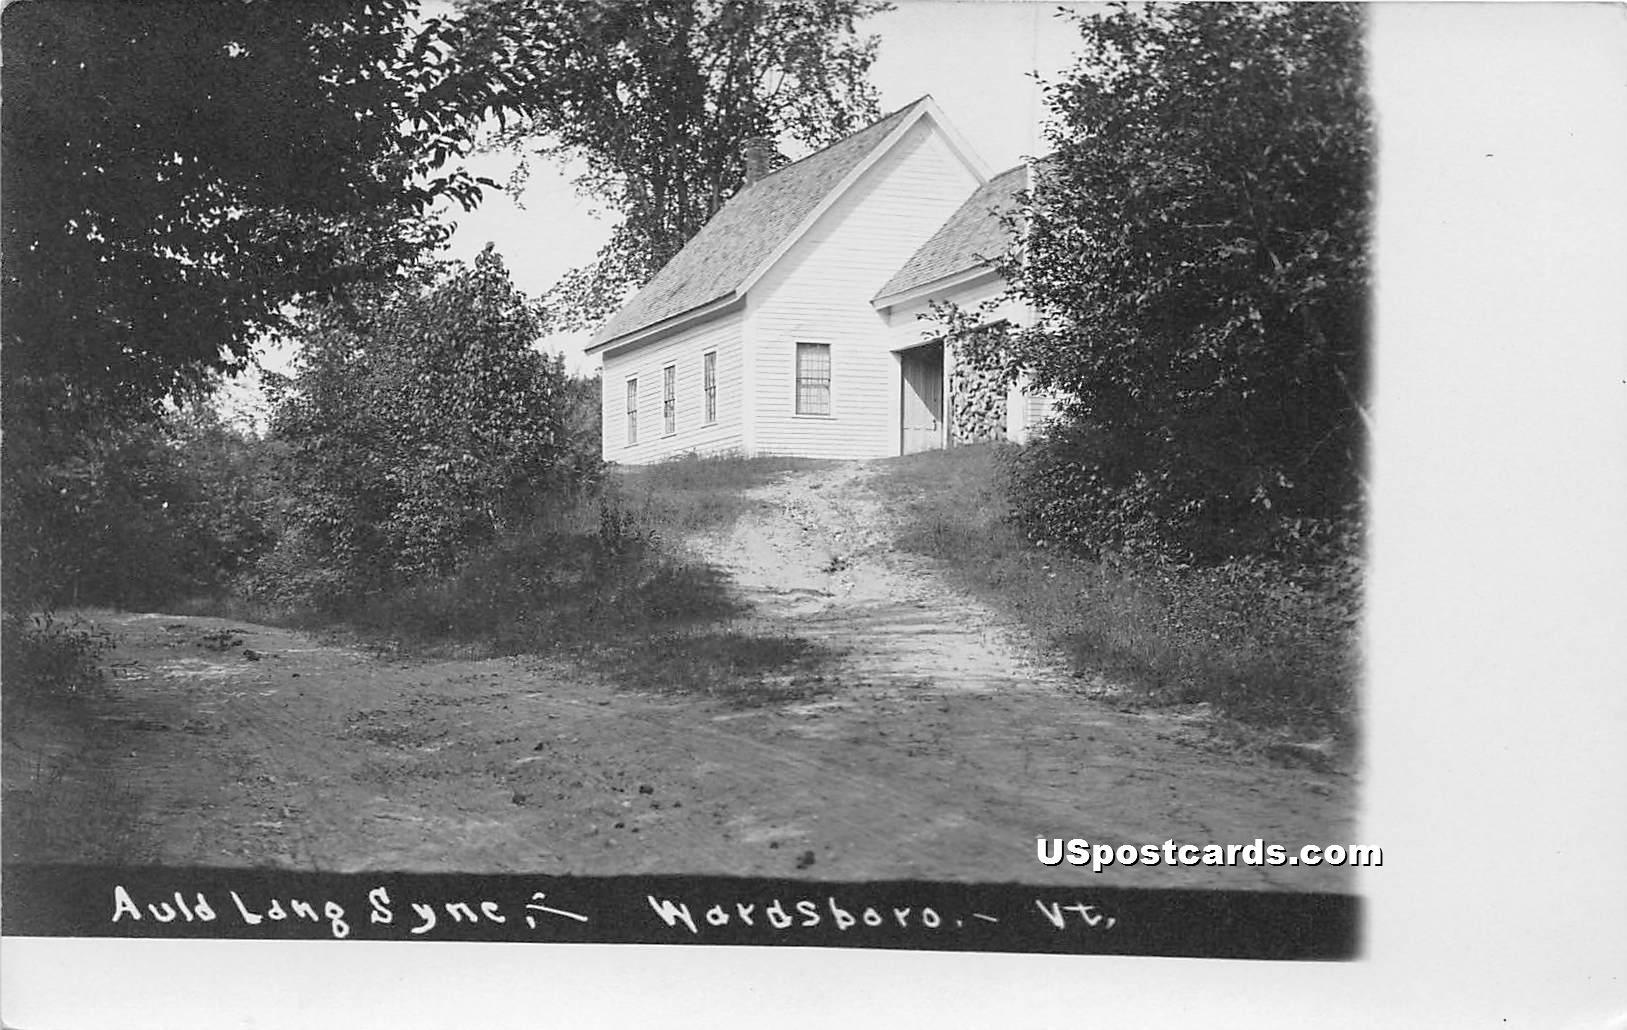 Auld Lang Sync - Wardsboro, Vermont VT Postcard